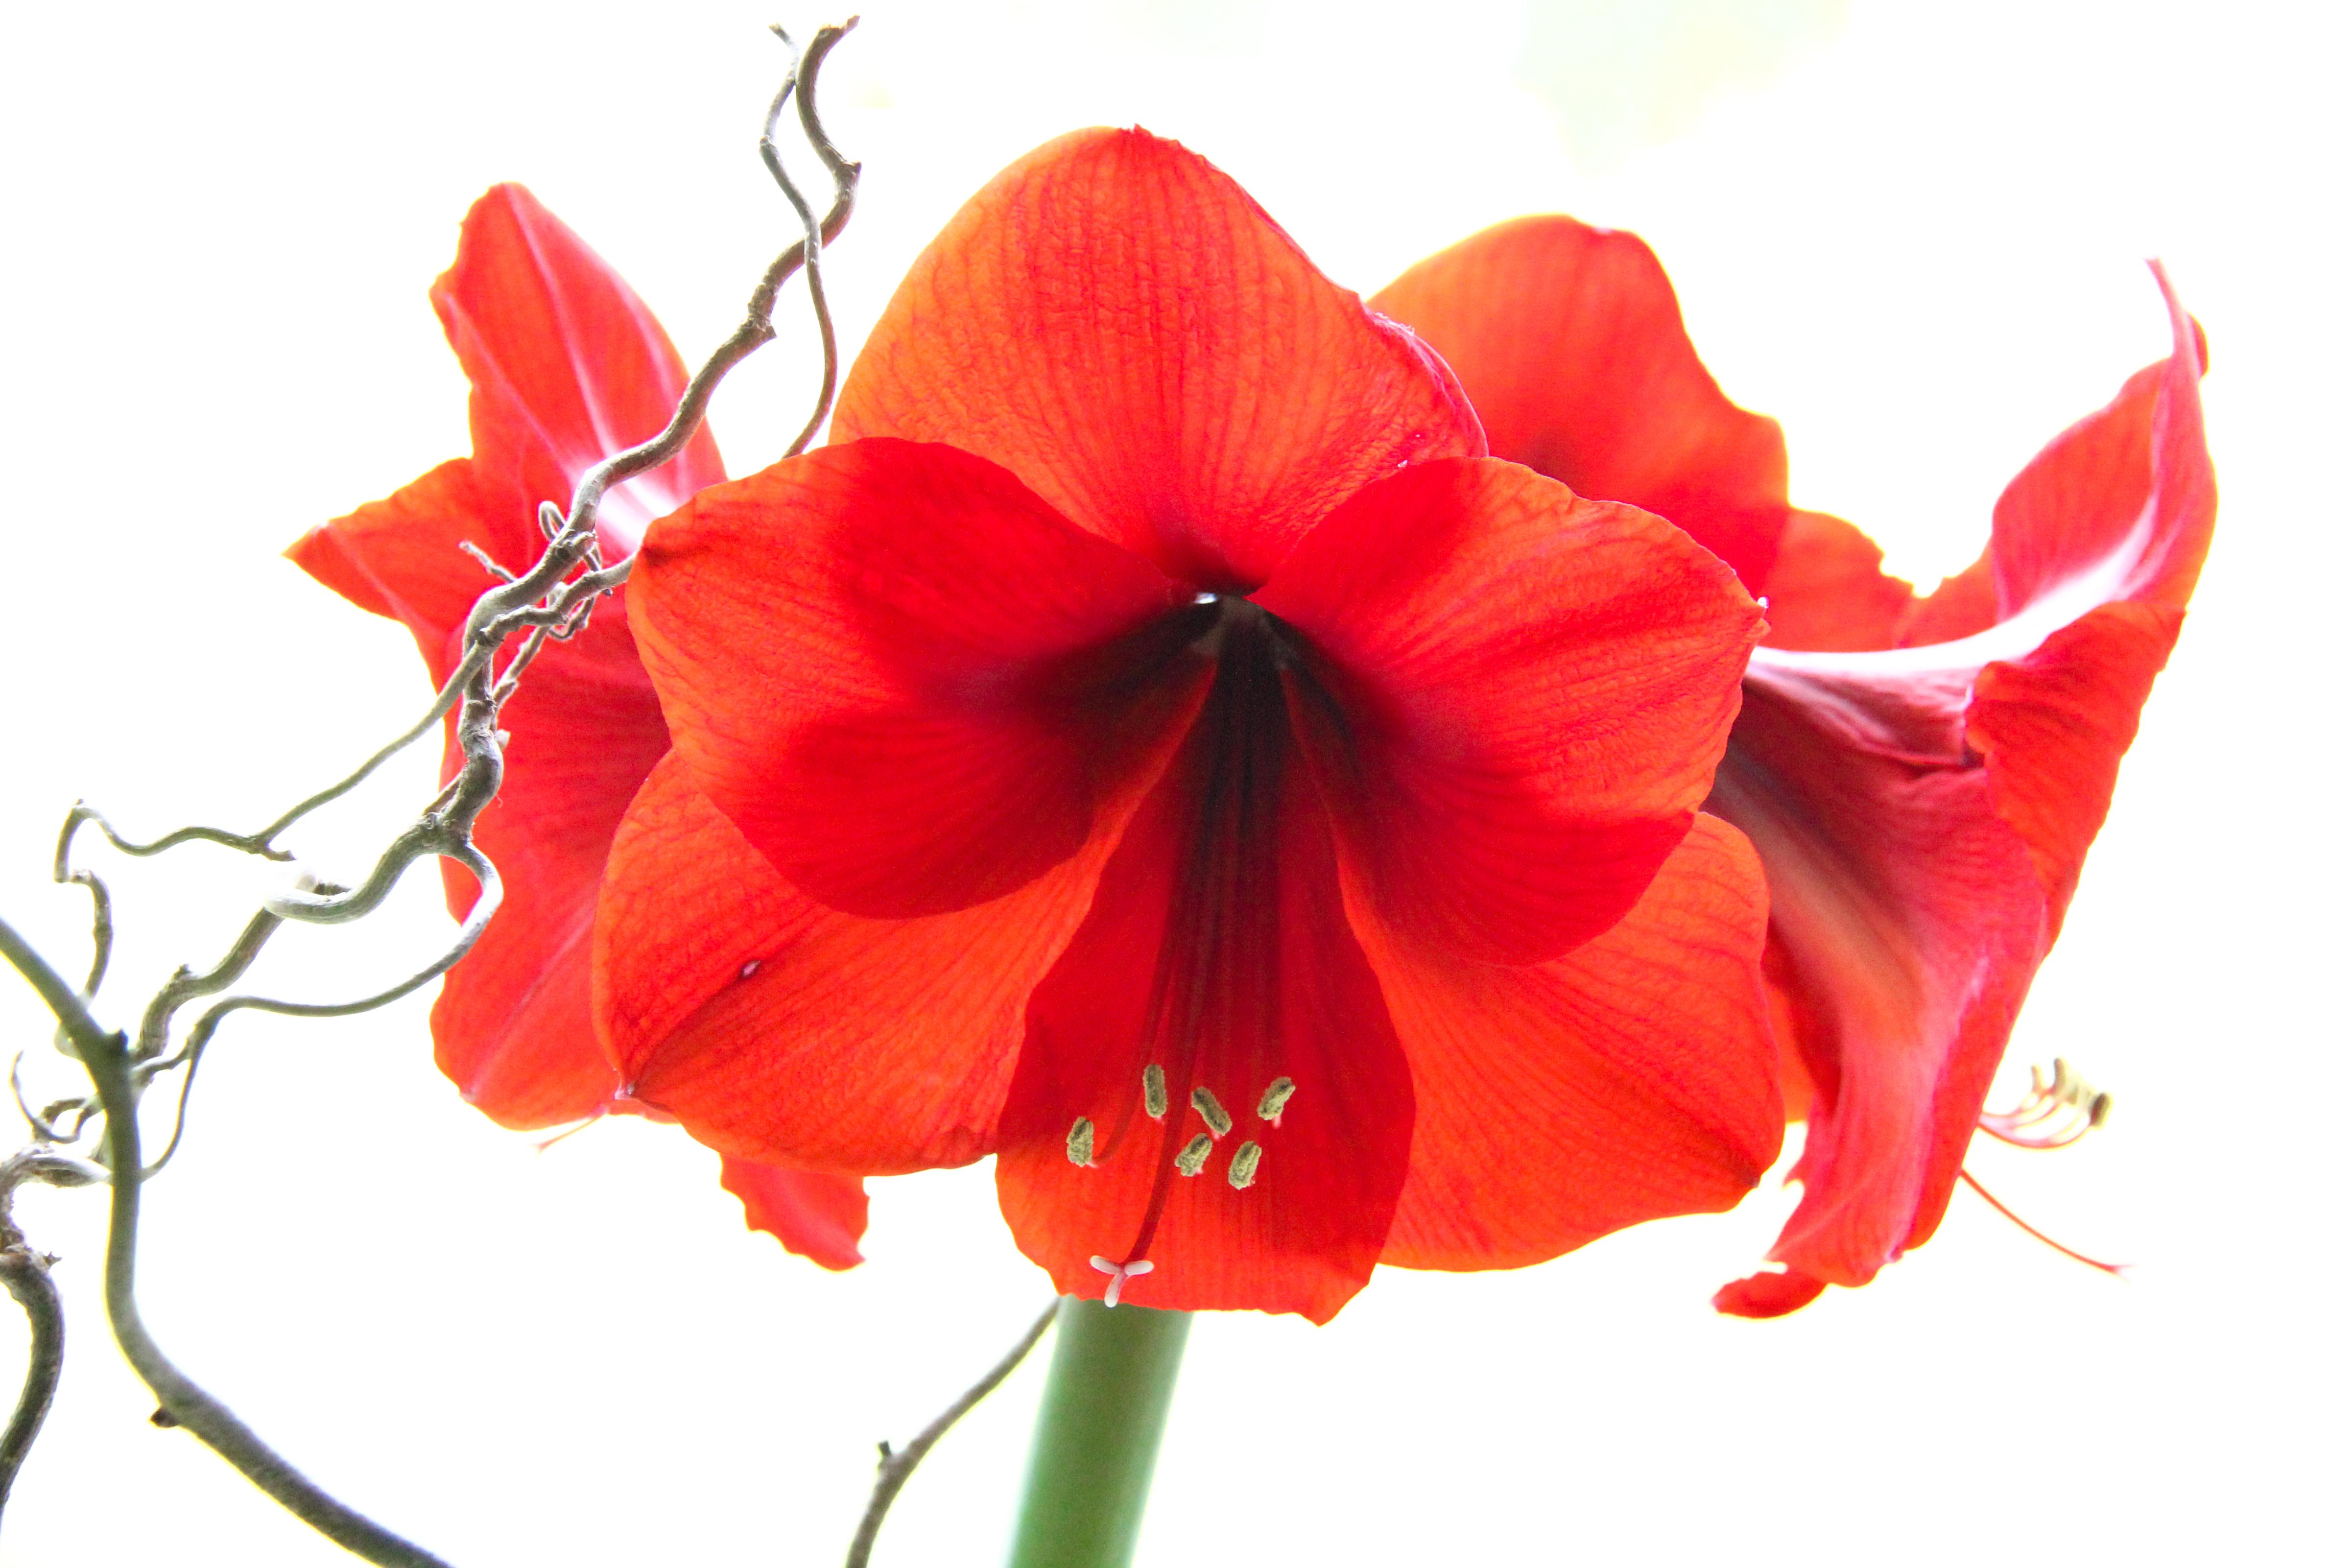 Red glowing fleur 4 x 6